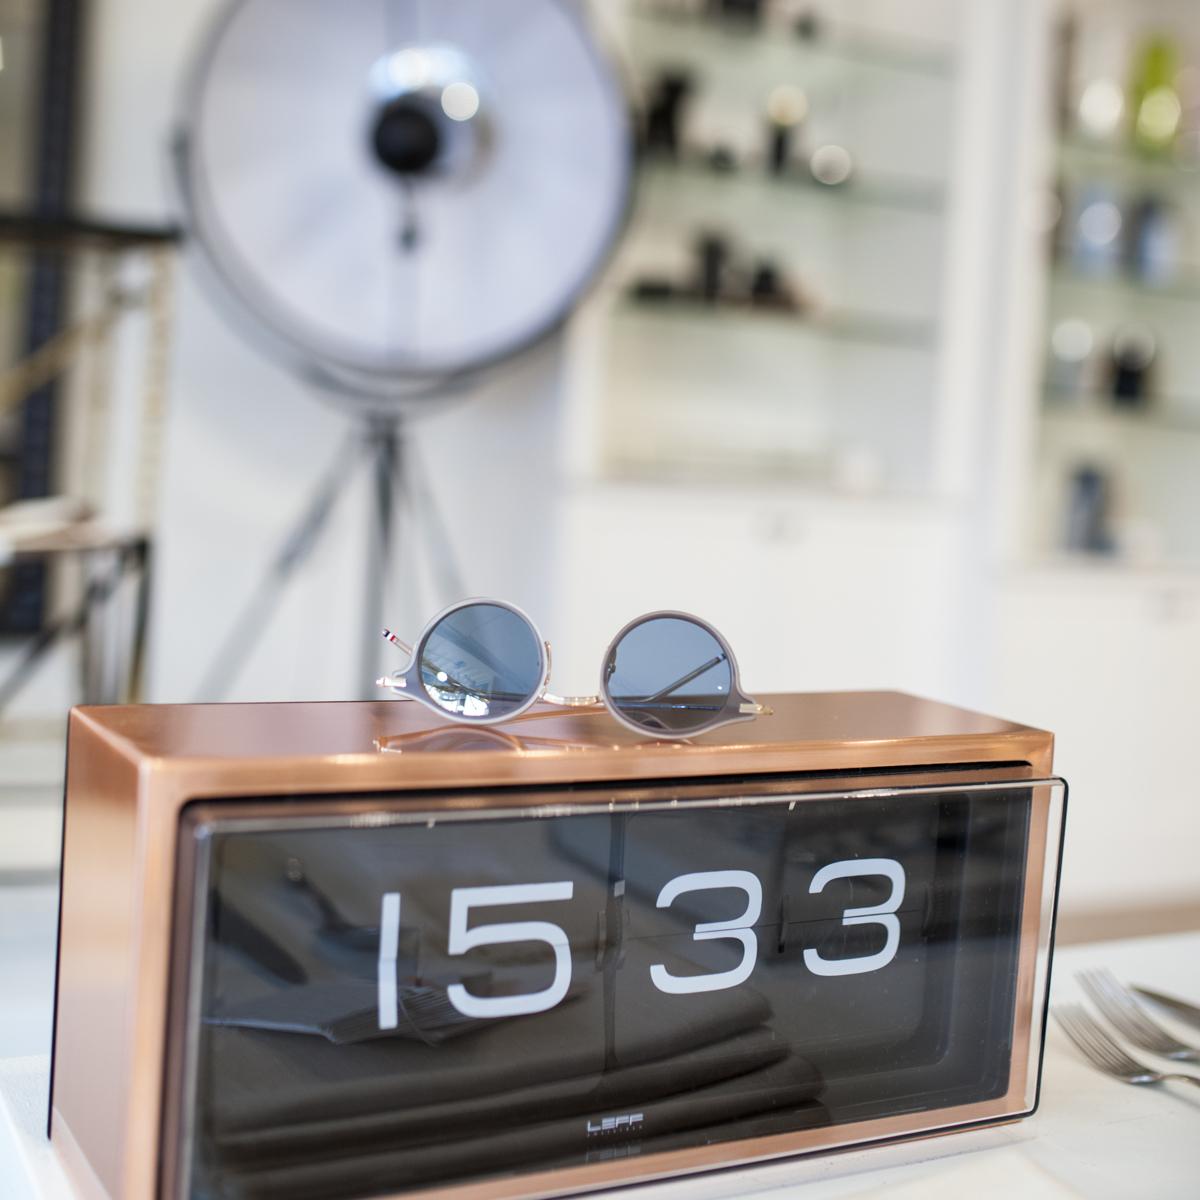 Thom Browne Sunglass TB-807 on top of a Leff Amsterdam Brick Clock in copper.